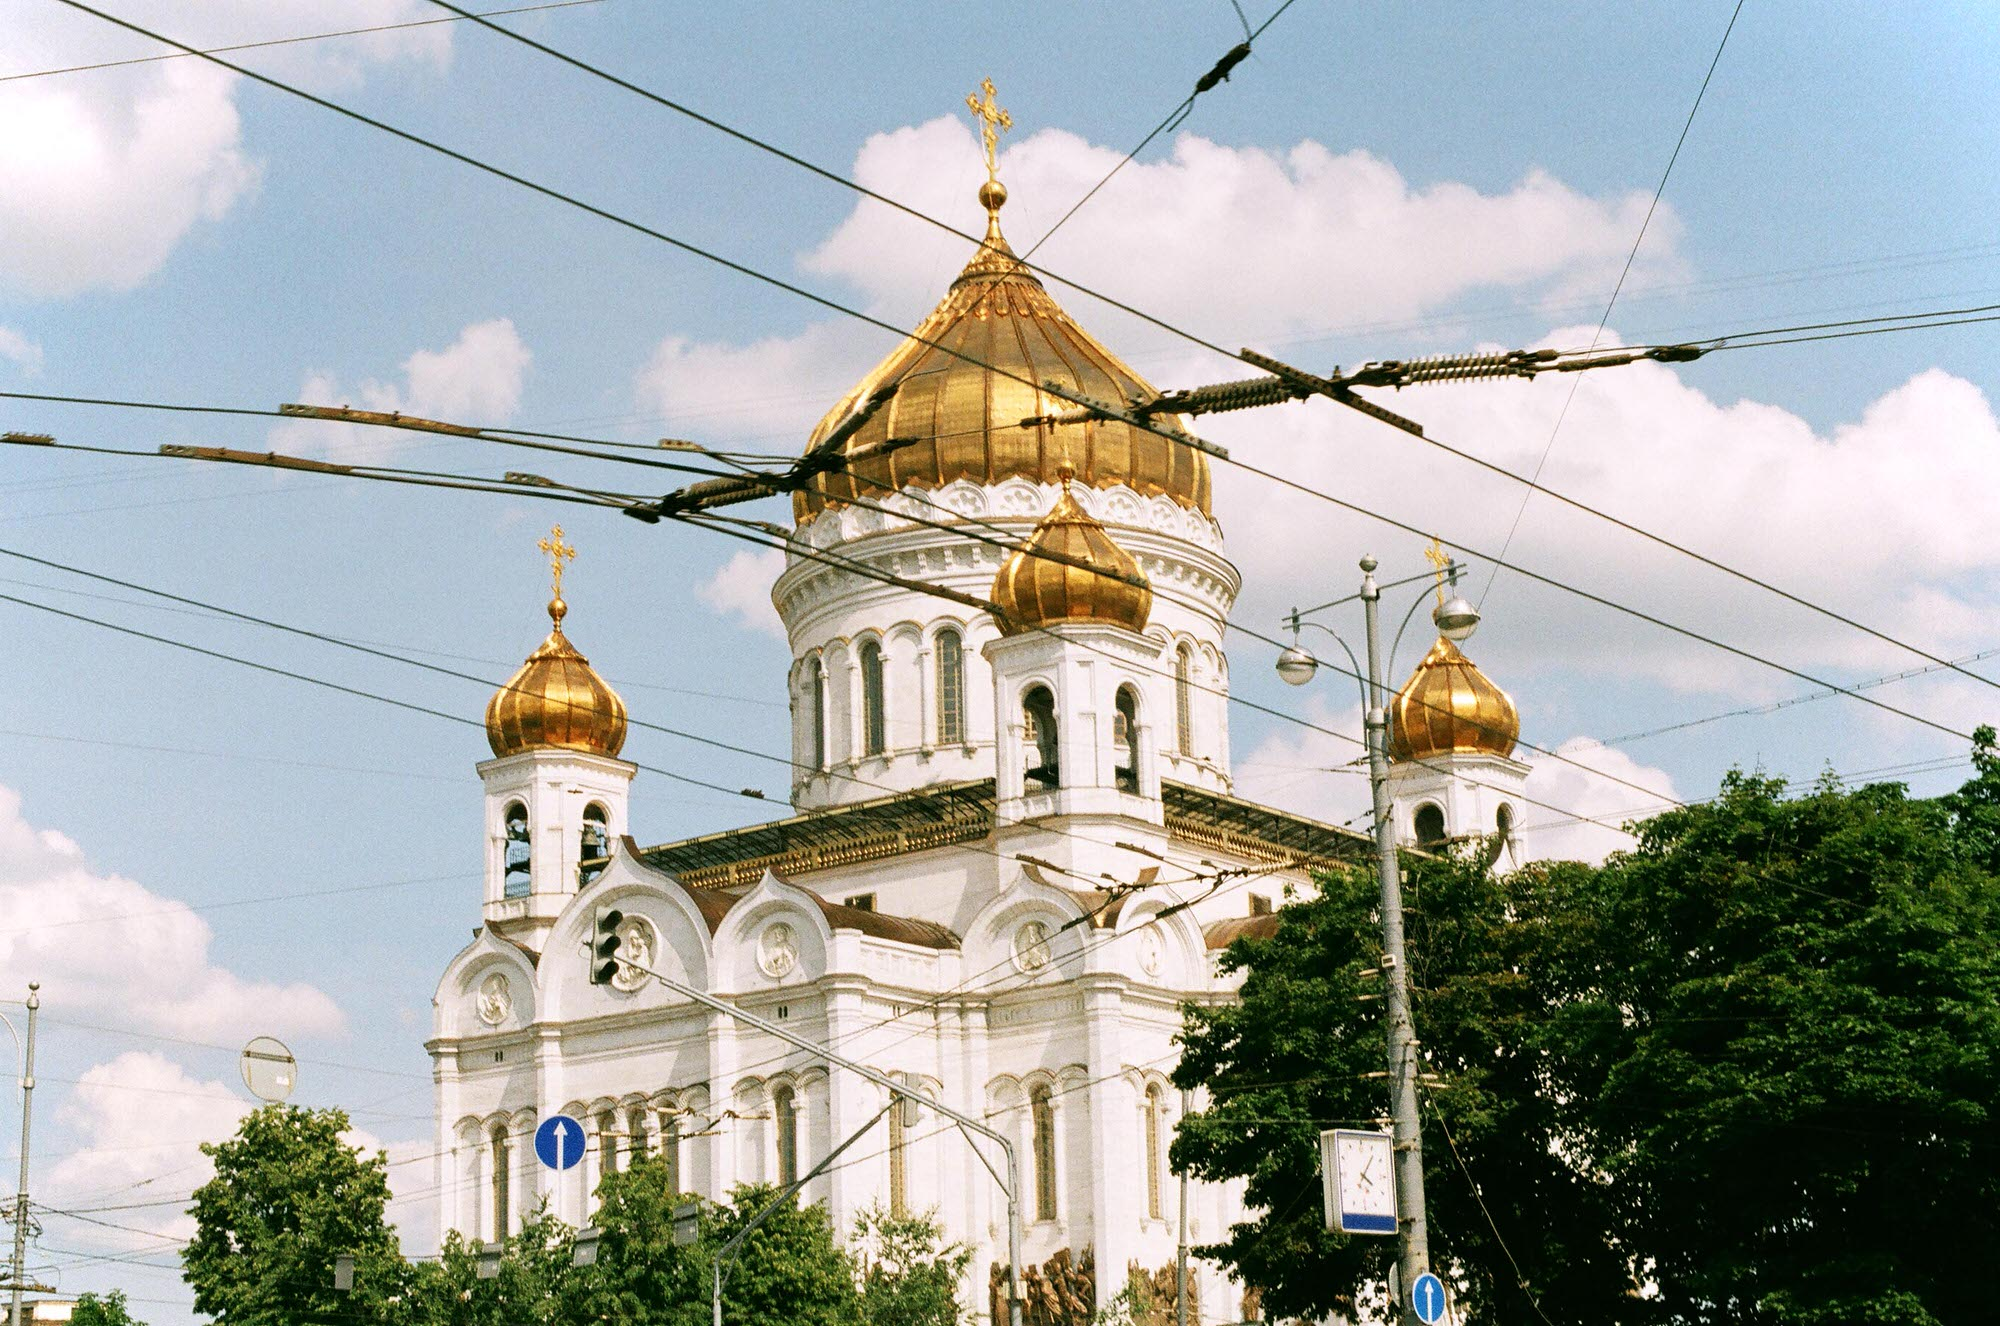 35mmPatrikWallner_Moscow_GoldLOWQ